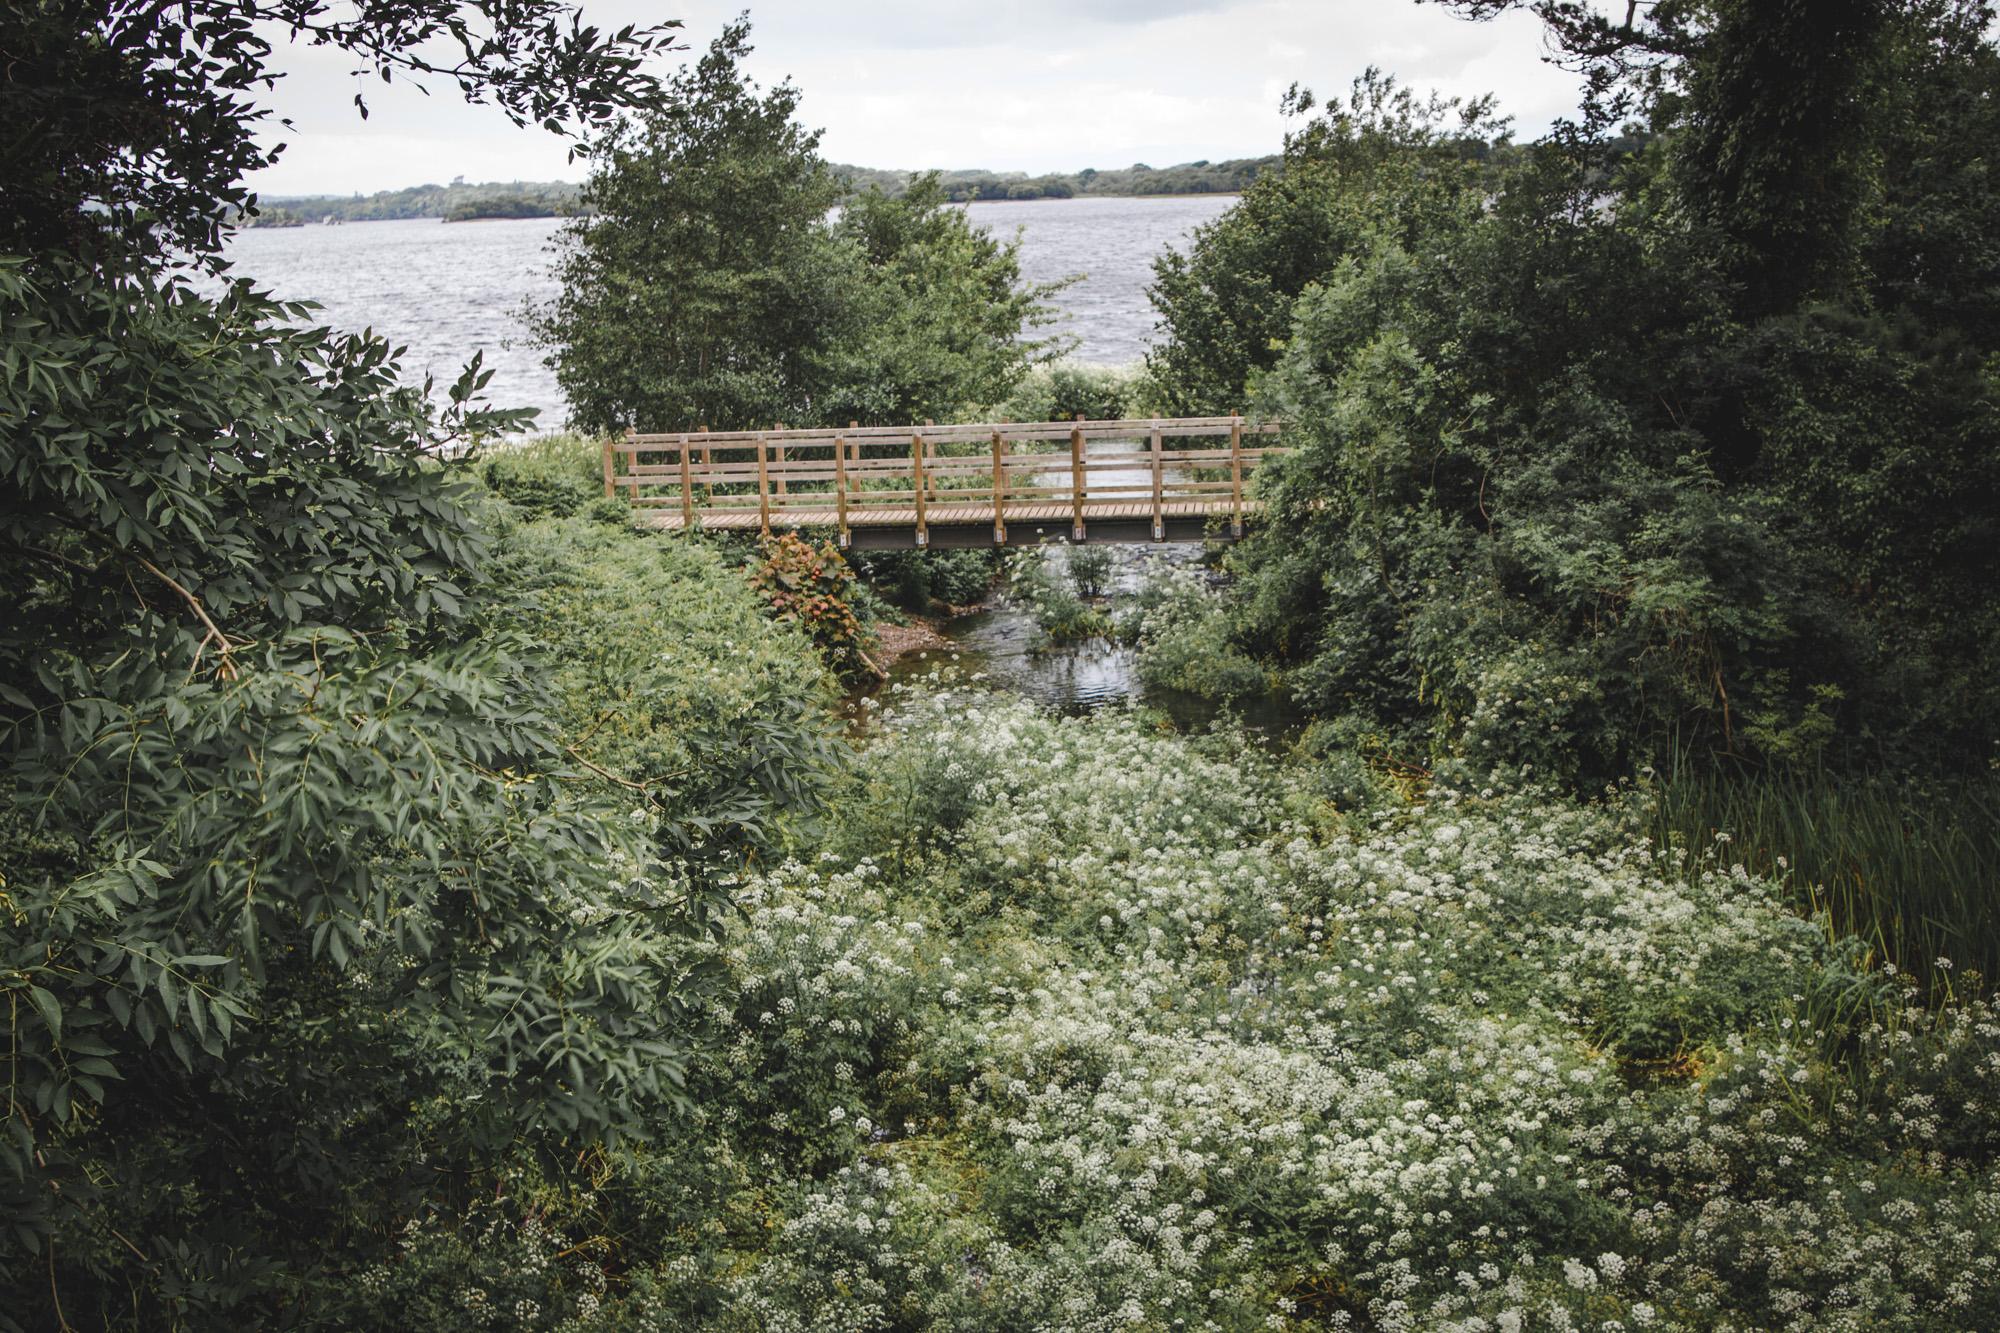 Bridge in Killarney National Park in Ireland